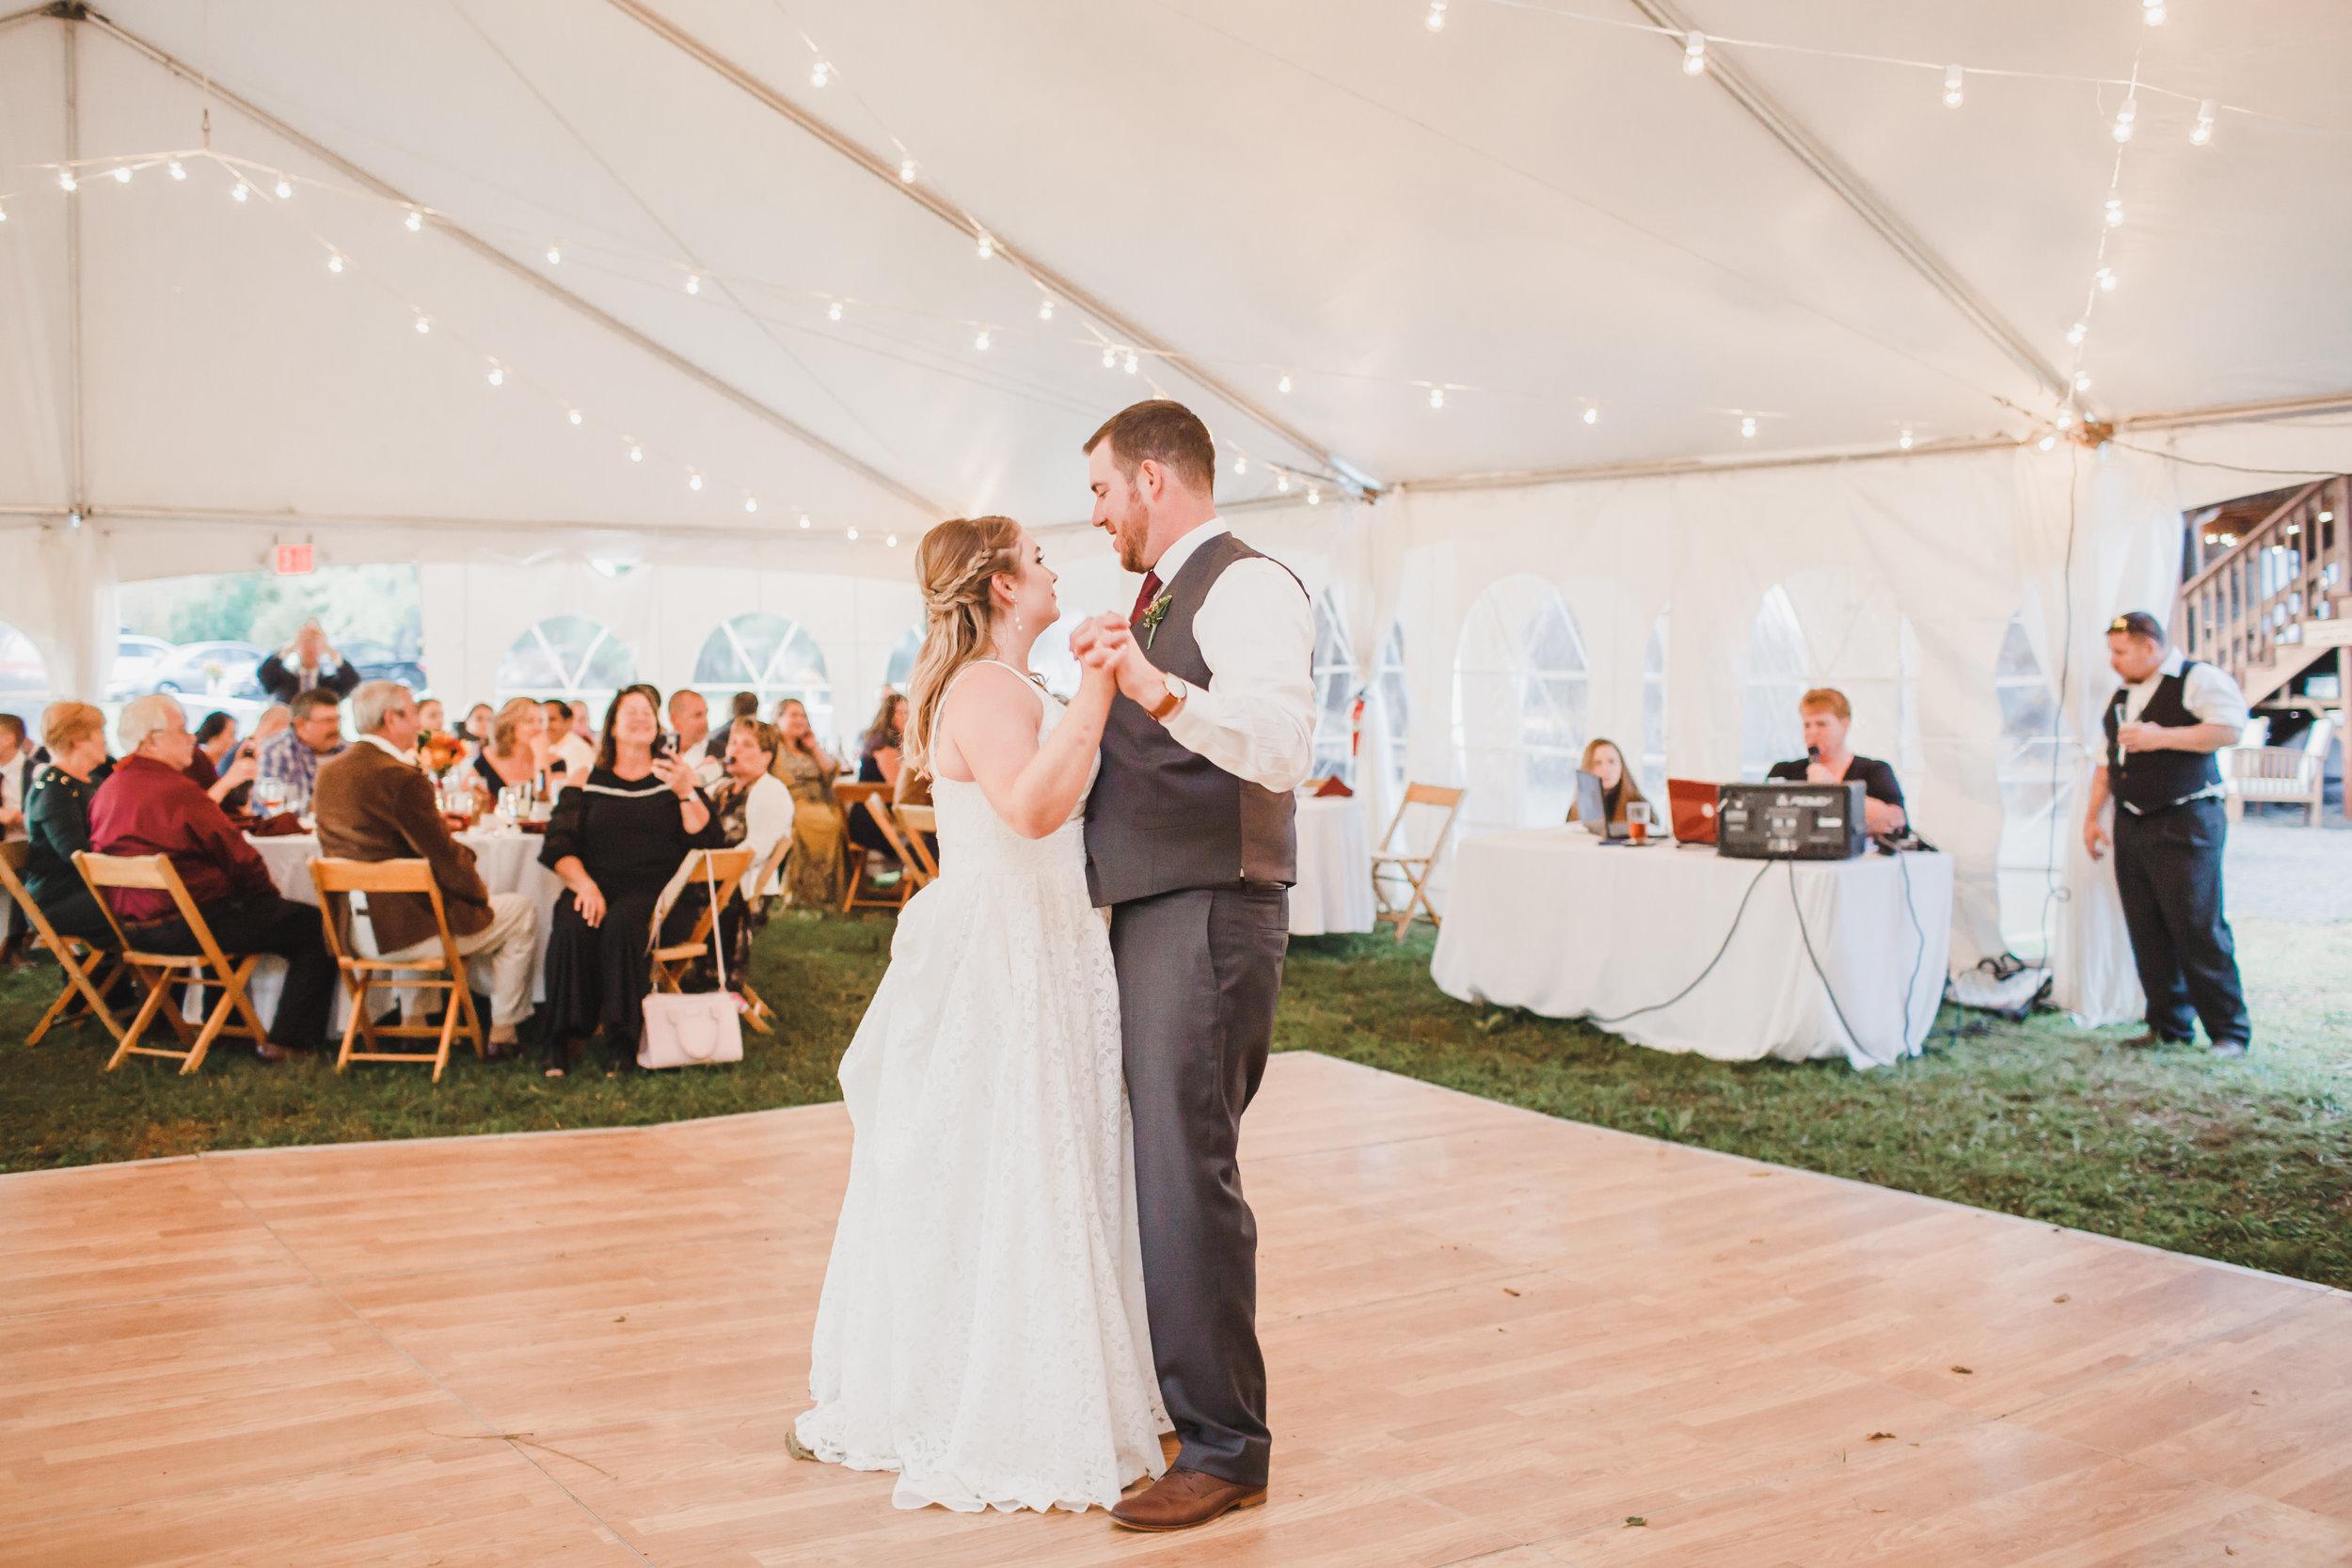 Fling - Virginia Wedding Photographer - Photography by Amy Nicole-4576-8.jpg